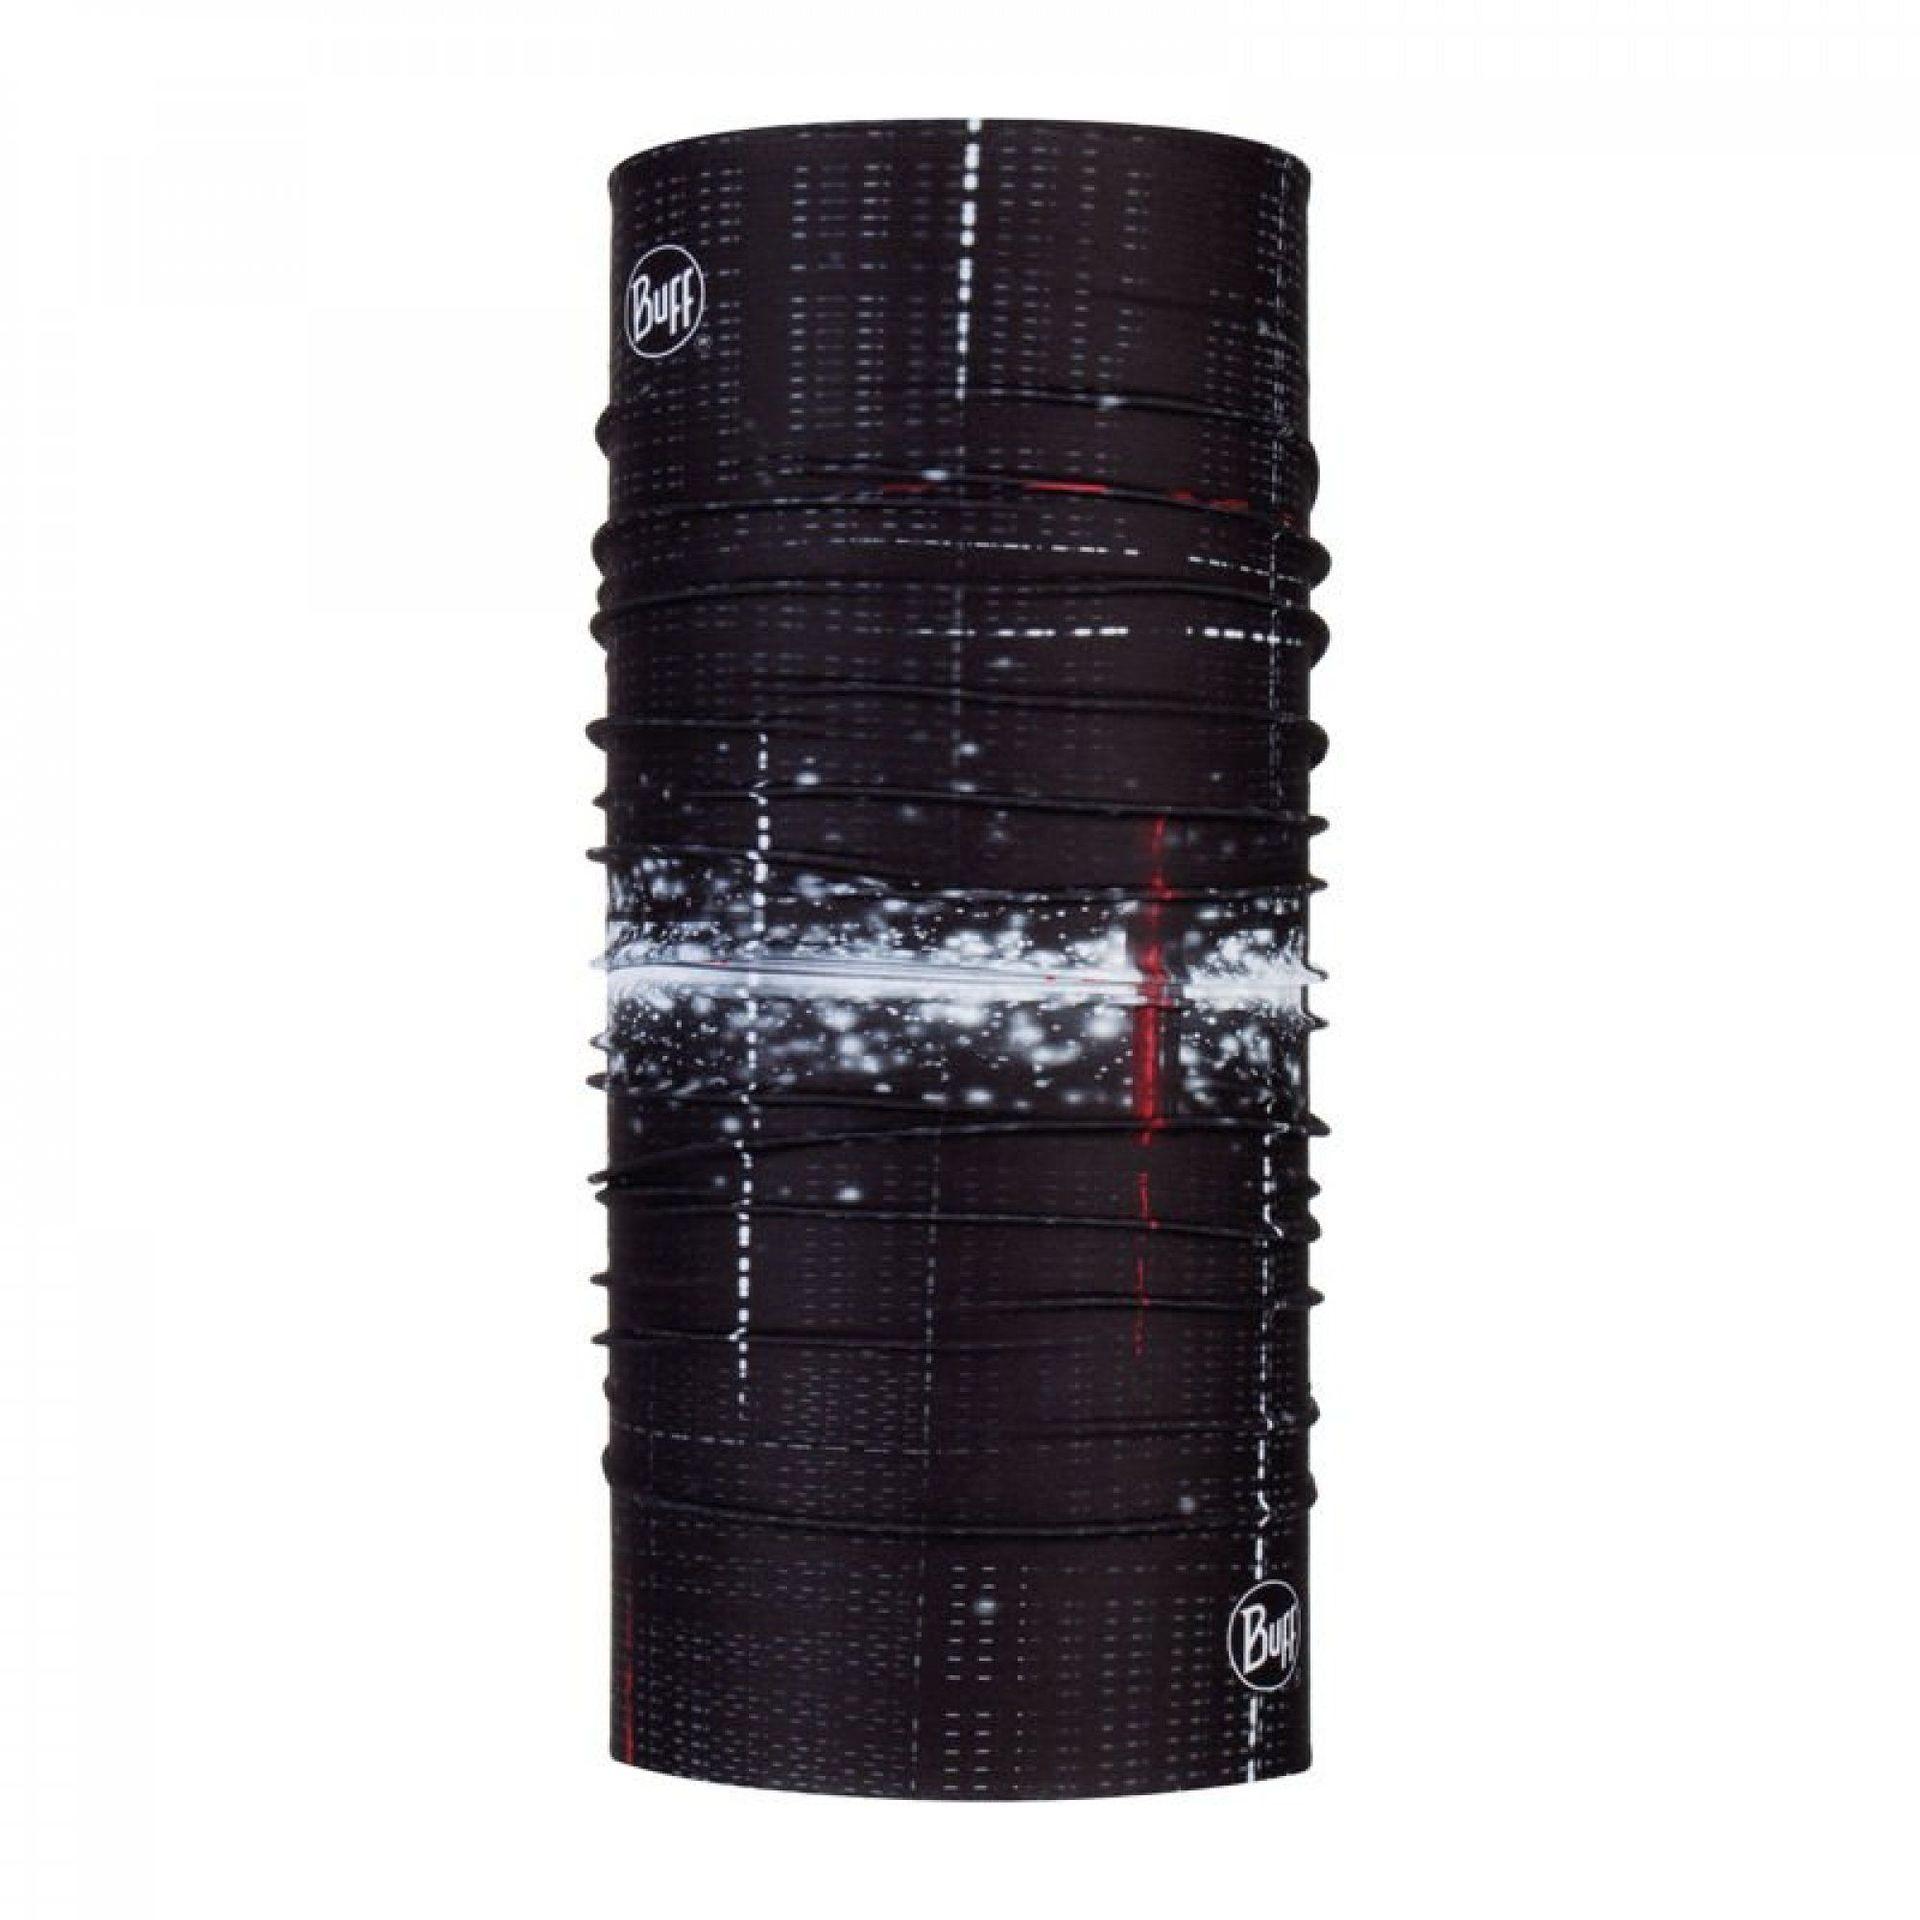 COOLNET UV+ LITHE BLACK - BLACK